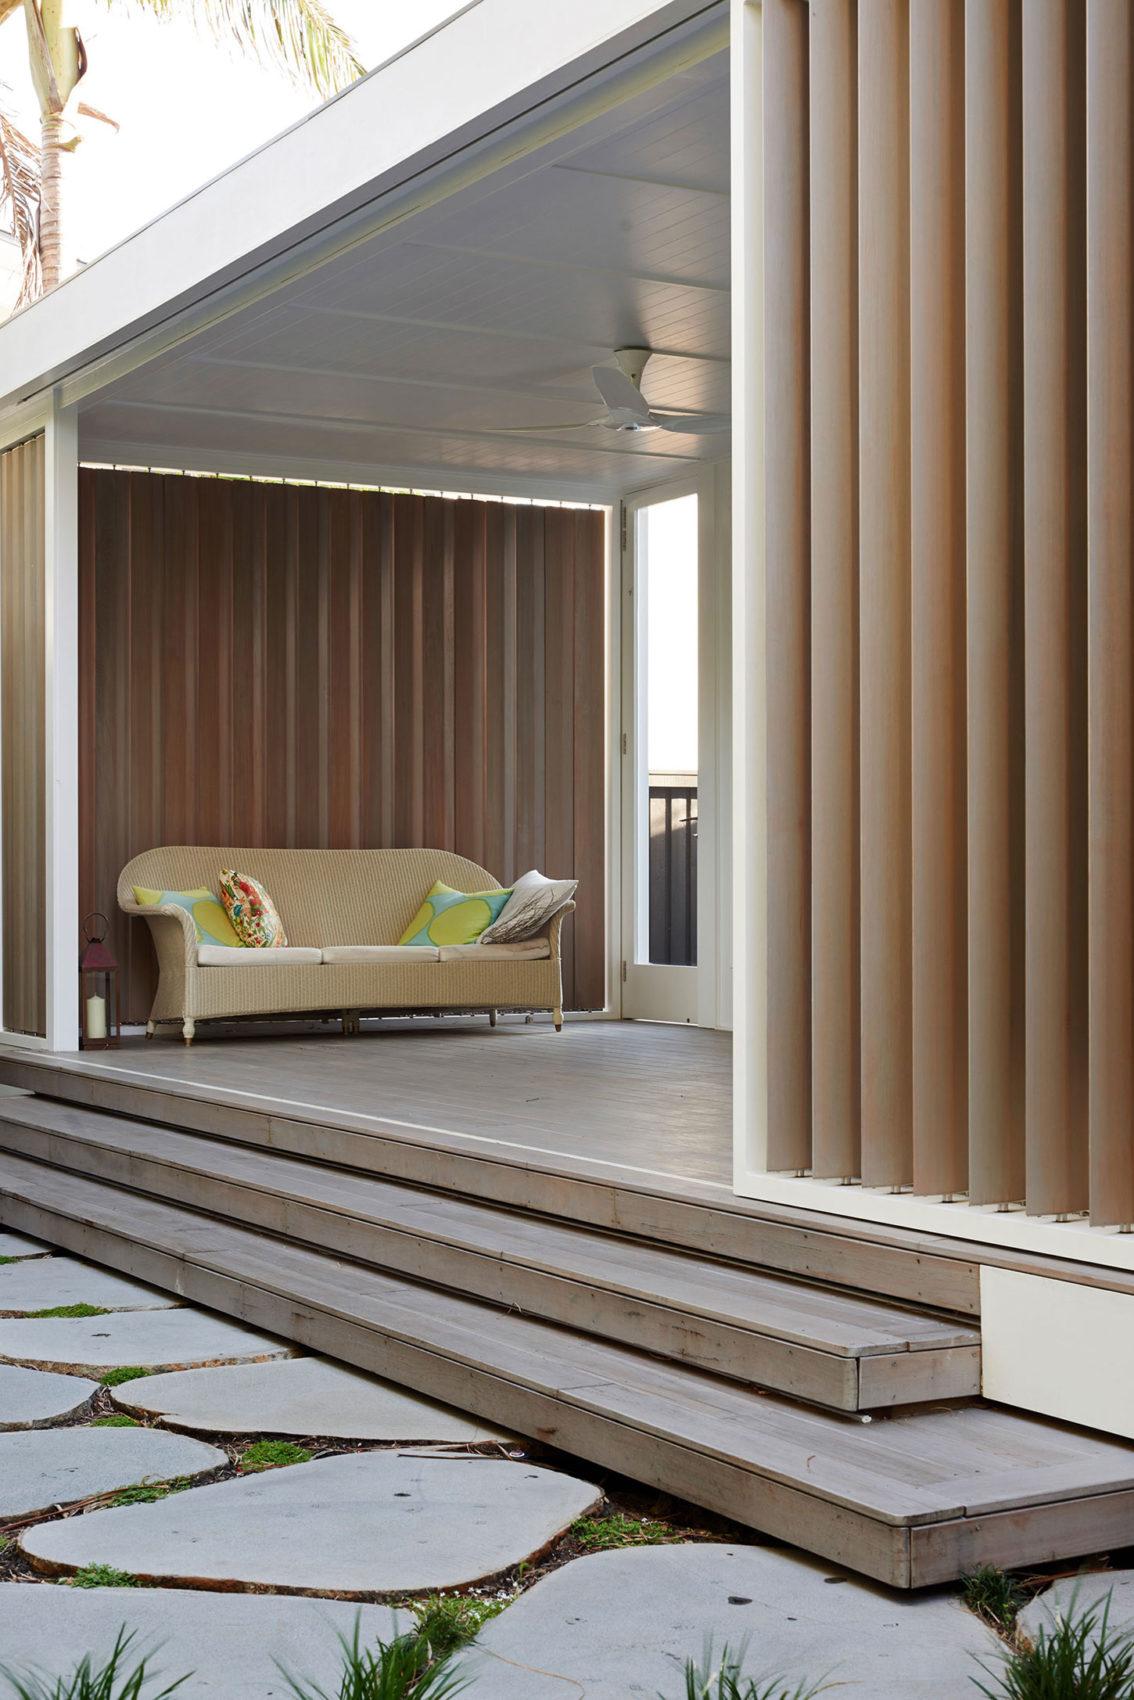 Beach House on Stilts by Luigi Rosselli Architects (7)